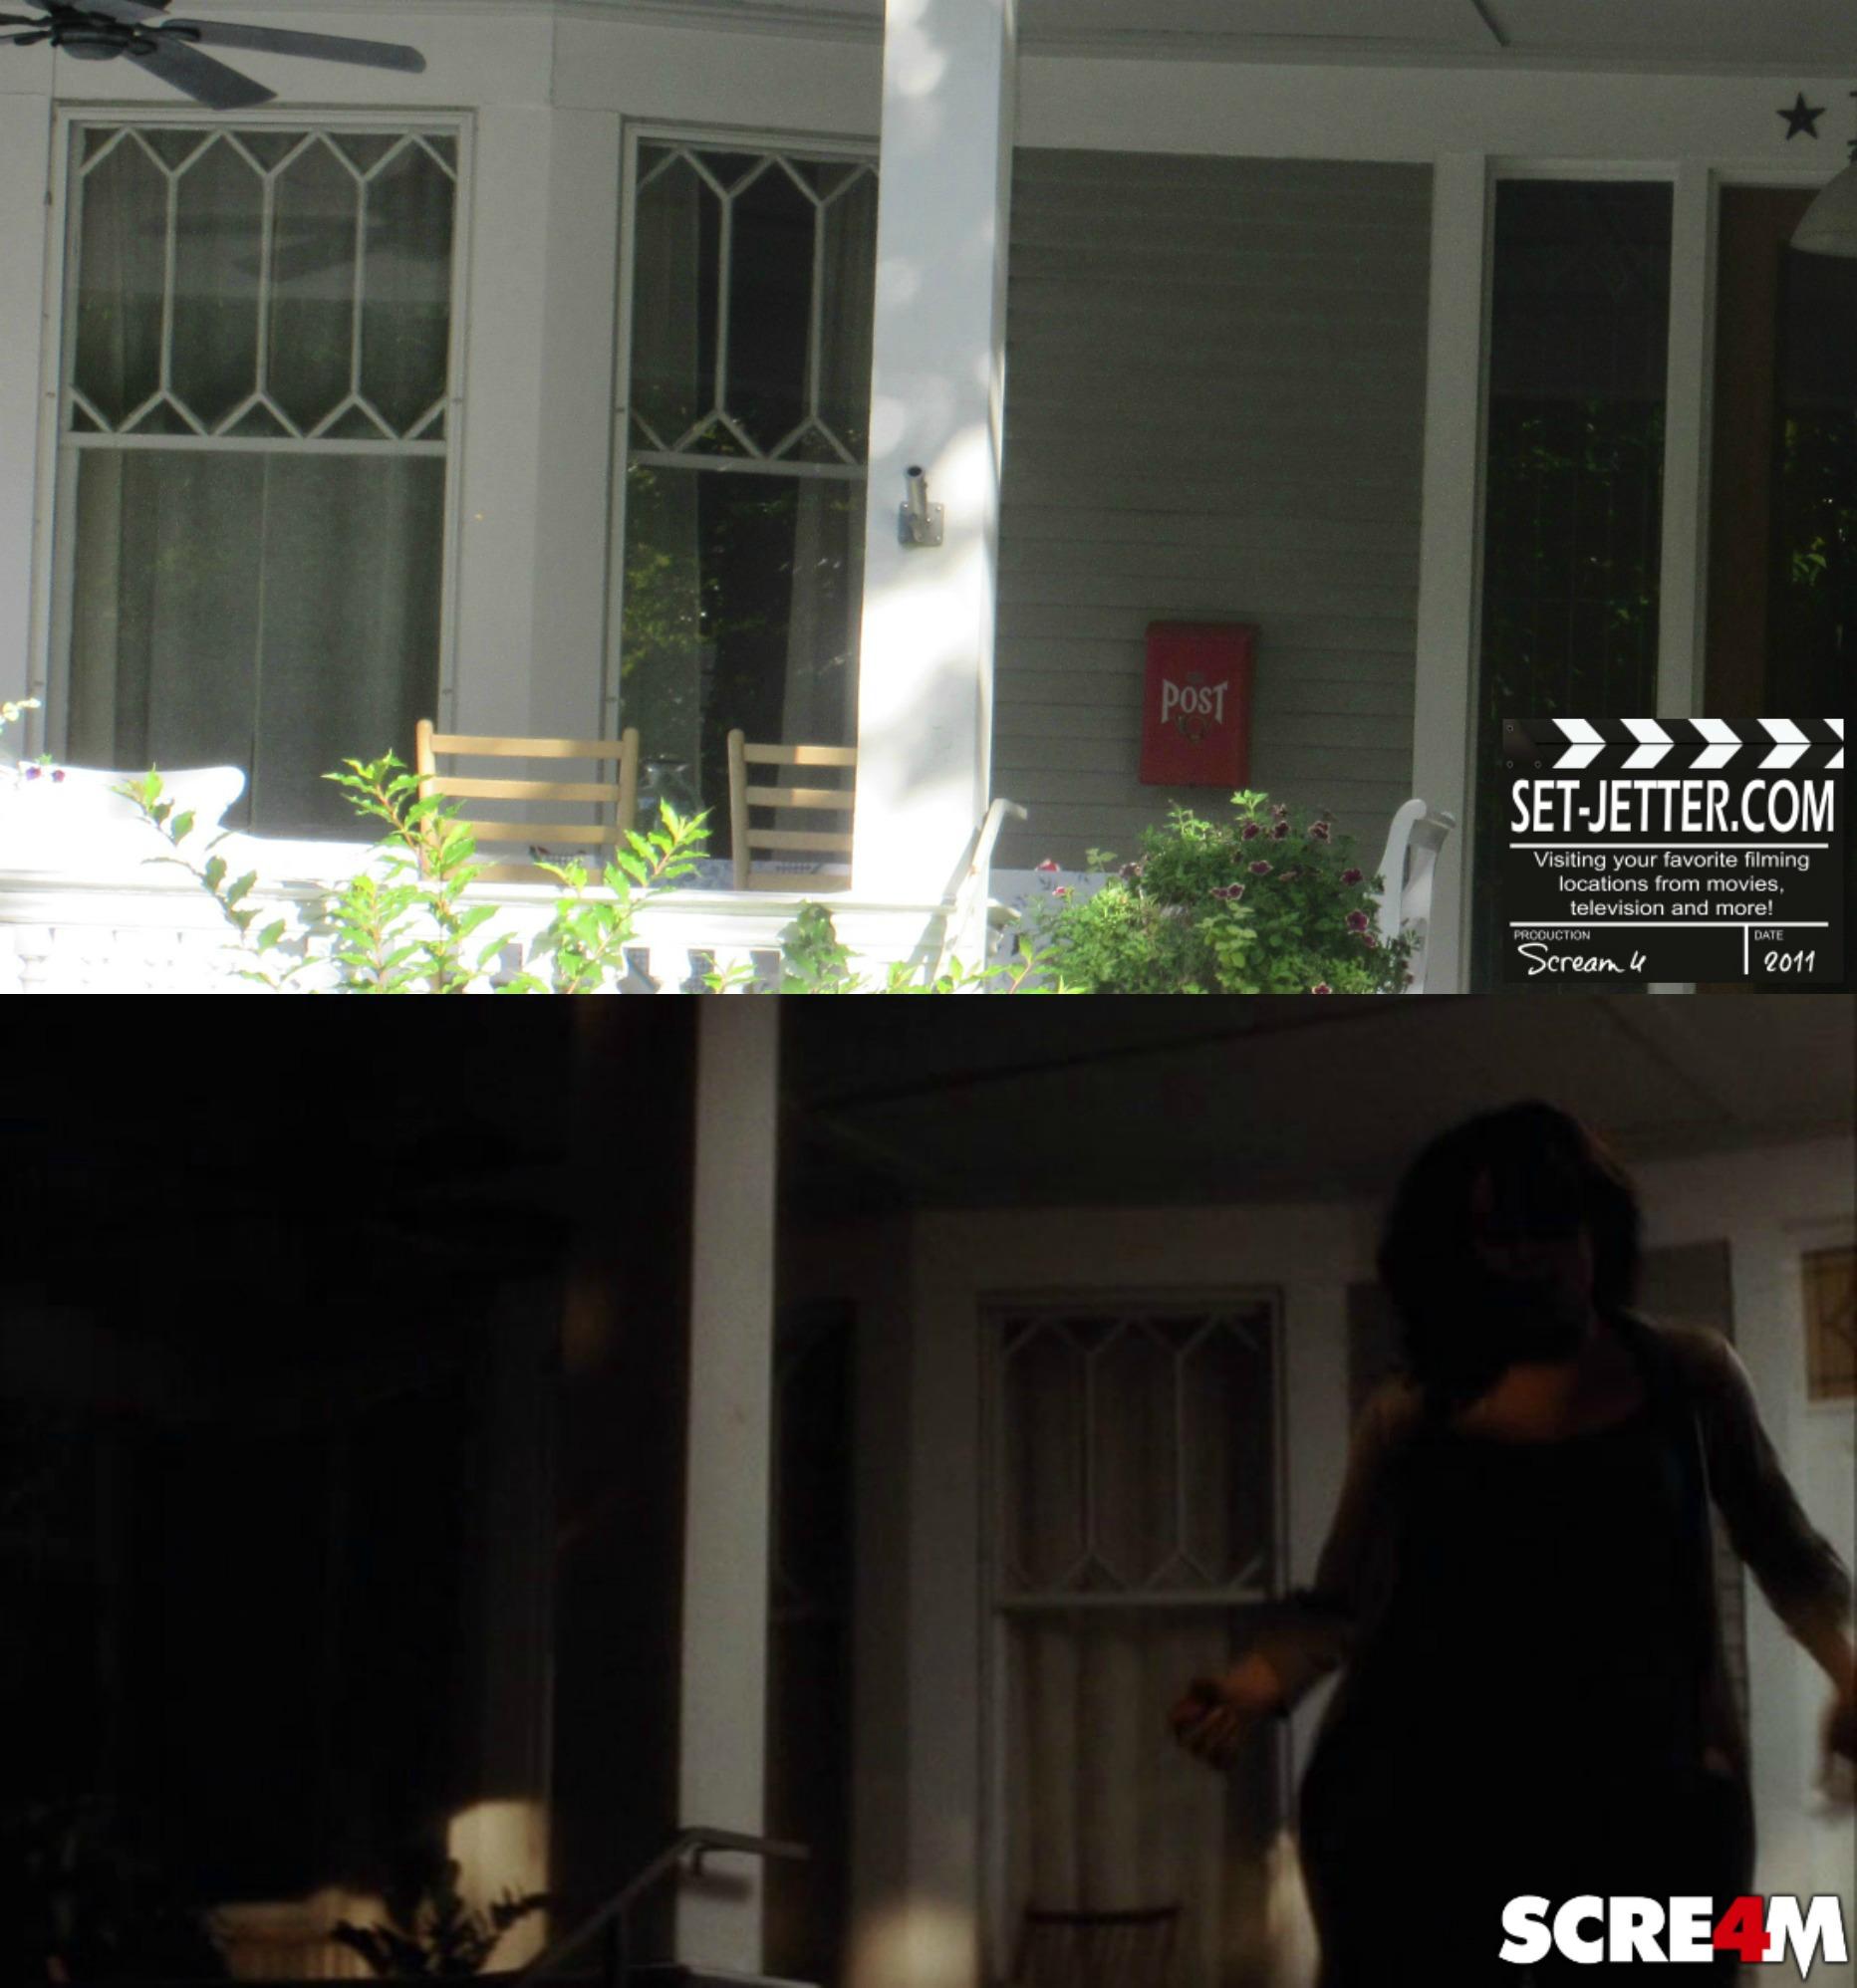 Scream4 comparison 117.jpg